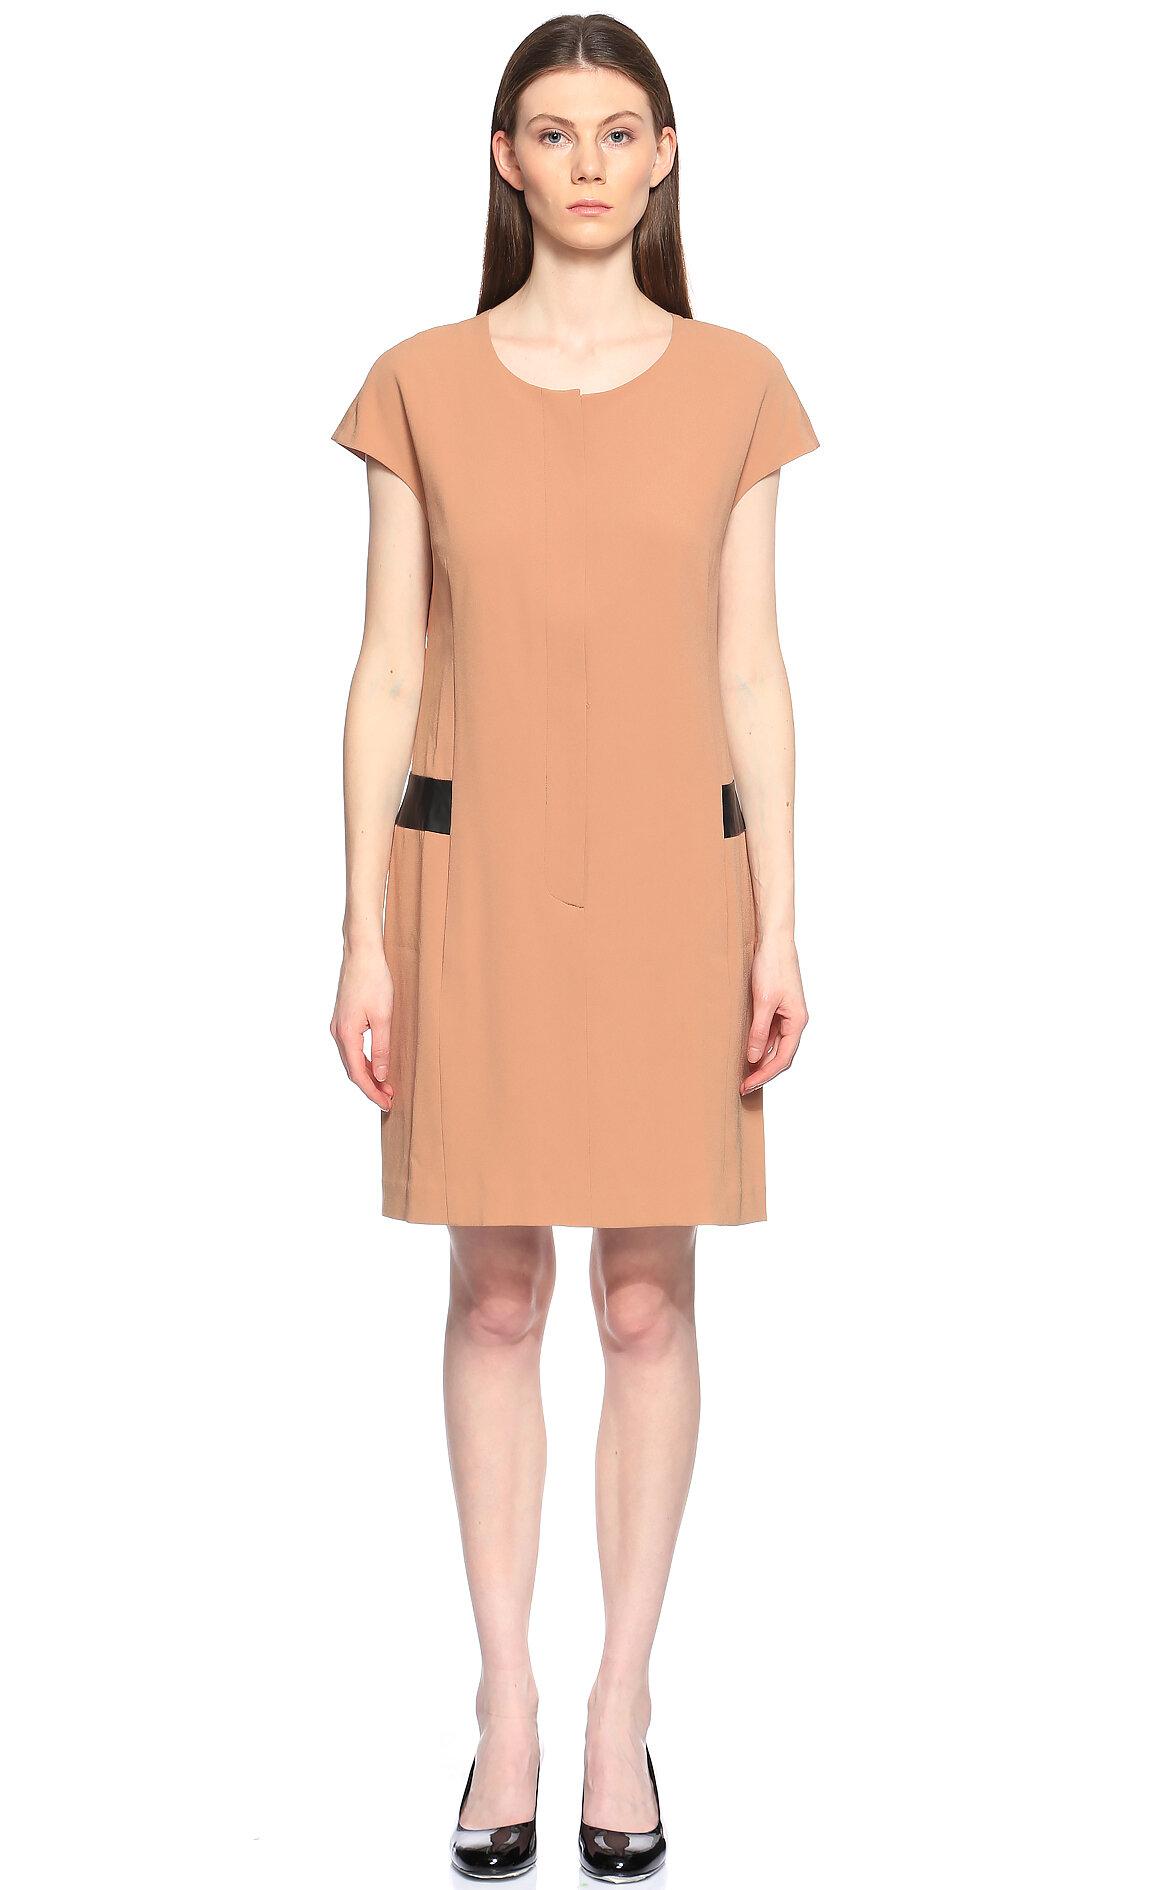 DKNY Önü Fermuarlı Bej Elbise